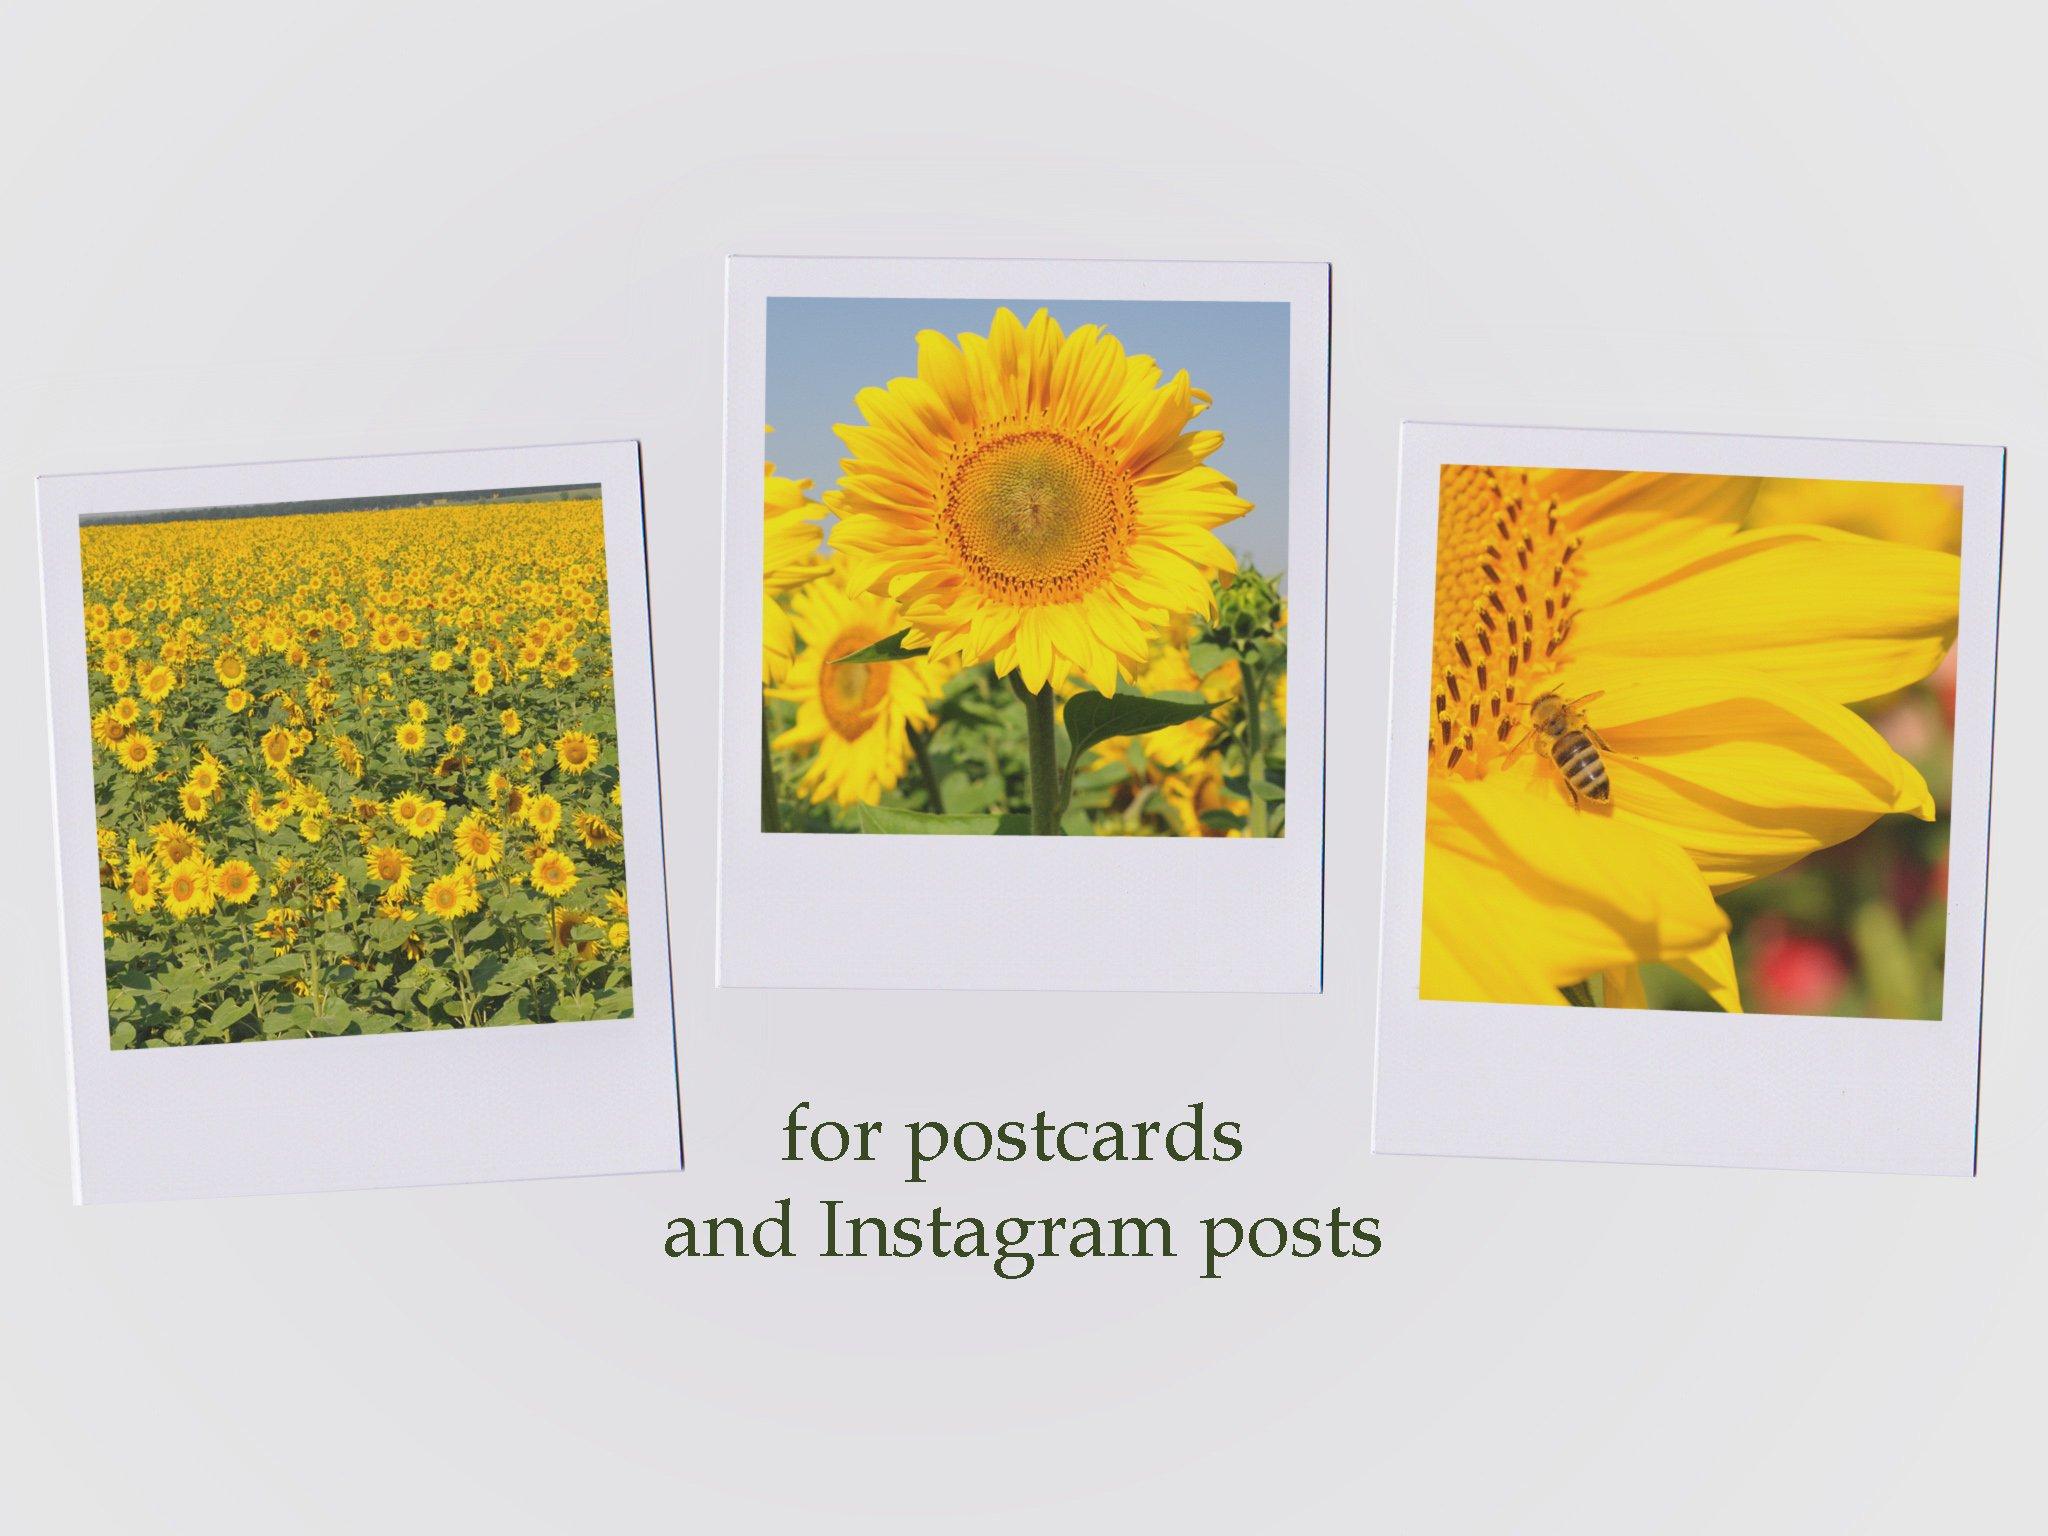 26 Sunflower Summer Photo Backgrounds example image 6